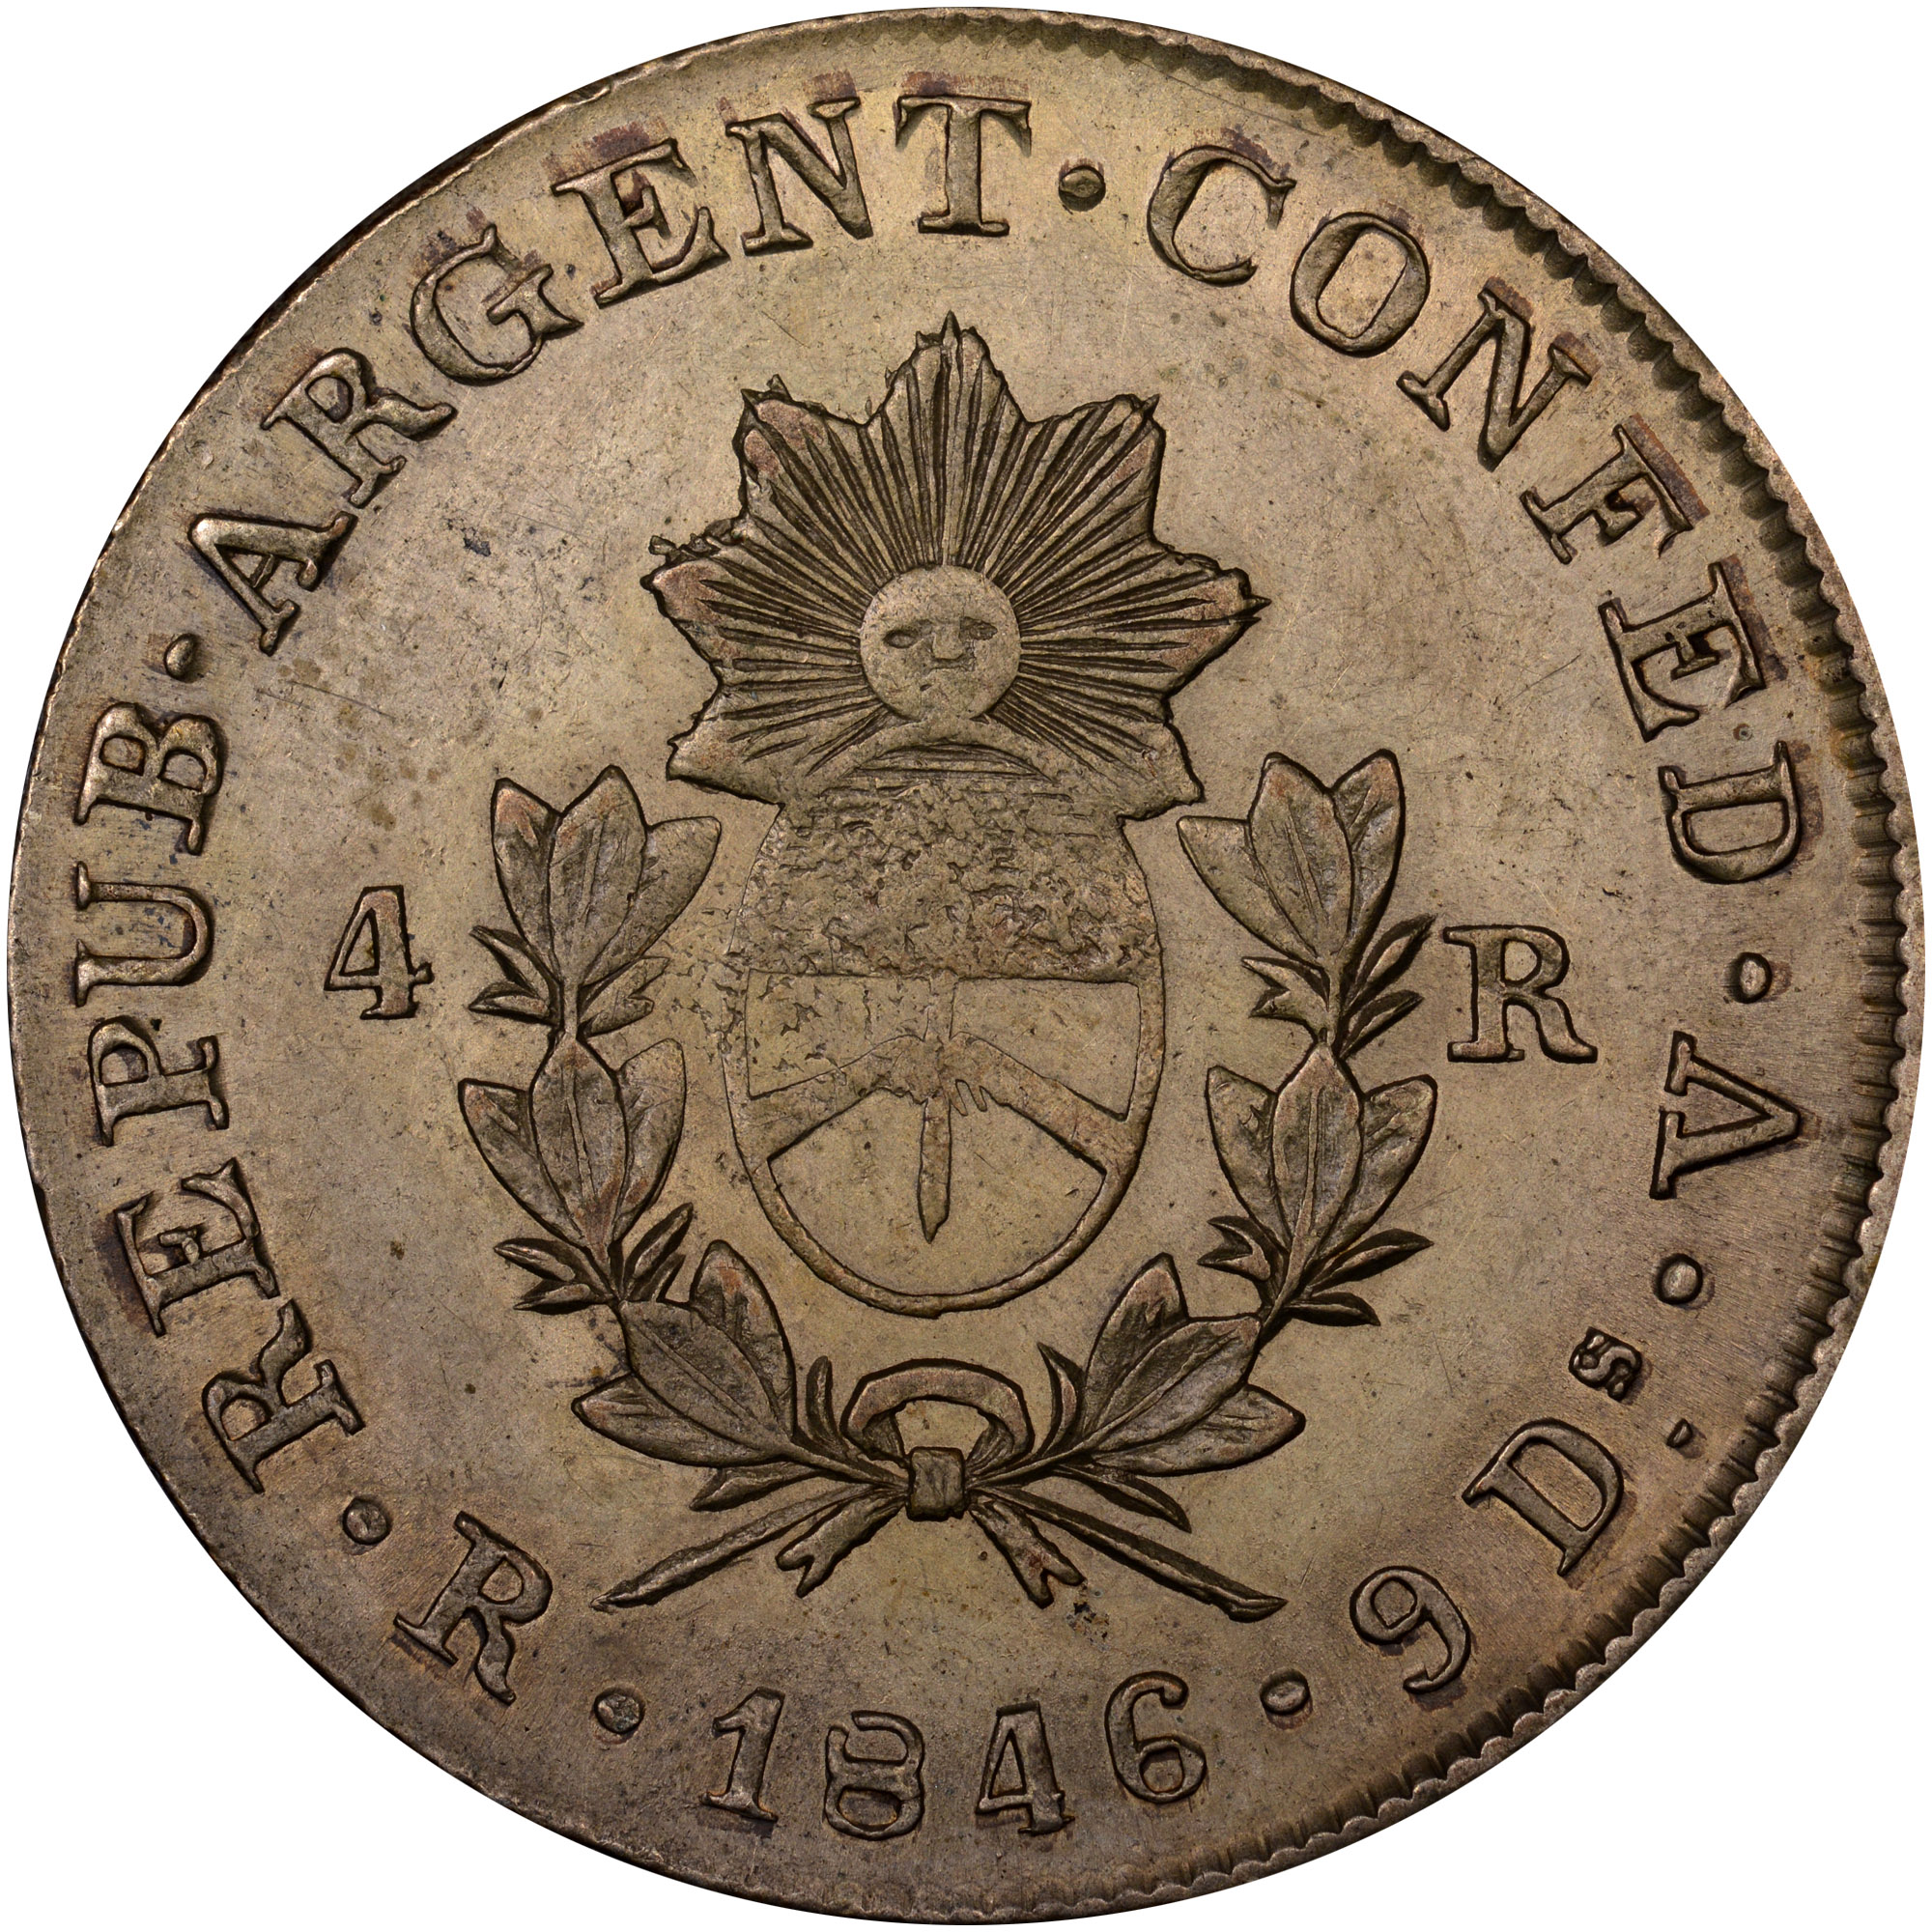 1846-1850 Argentina LA RIOJA 4 Reales obverse